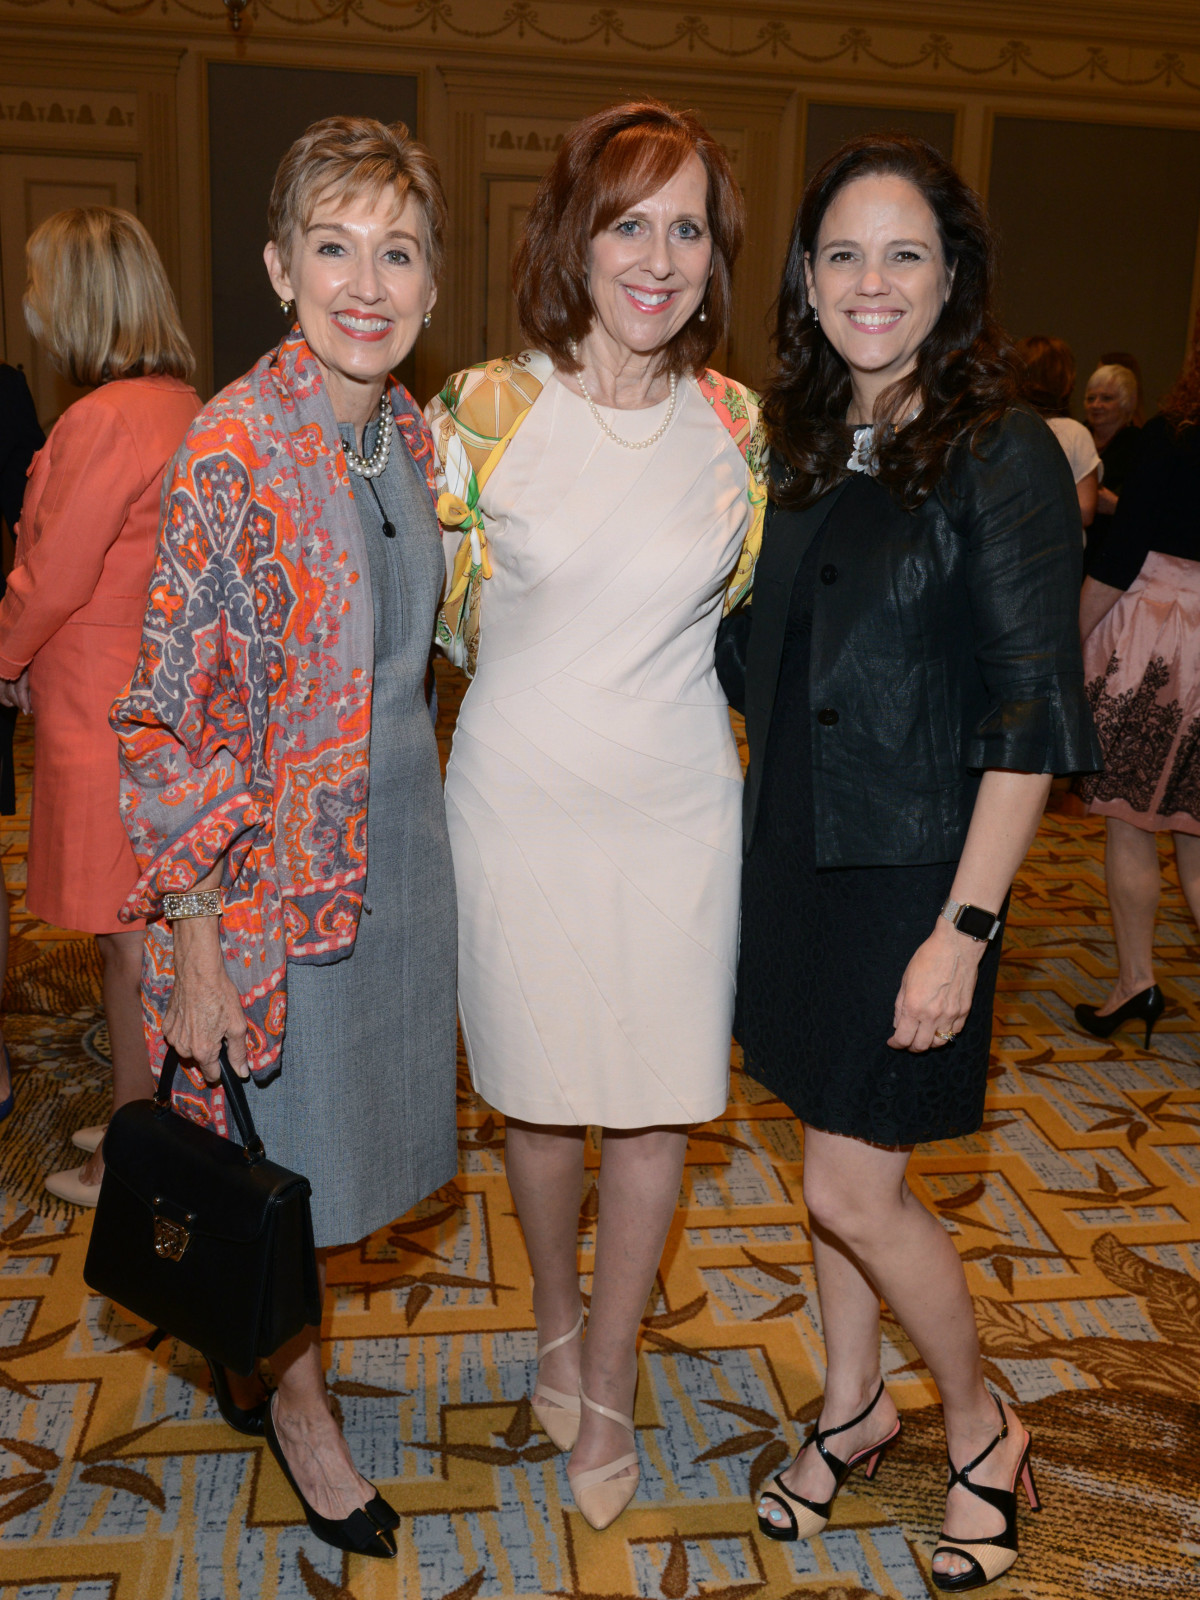 Suzy Gekiere, Susan Farris, Angie Kadesky